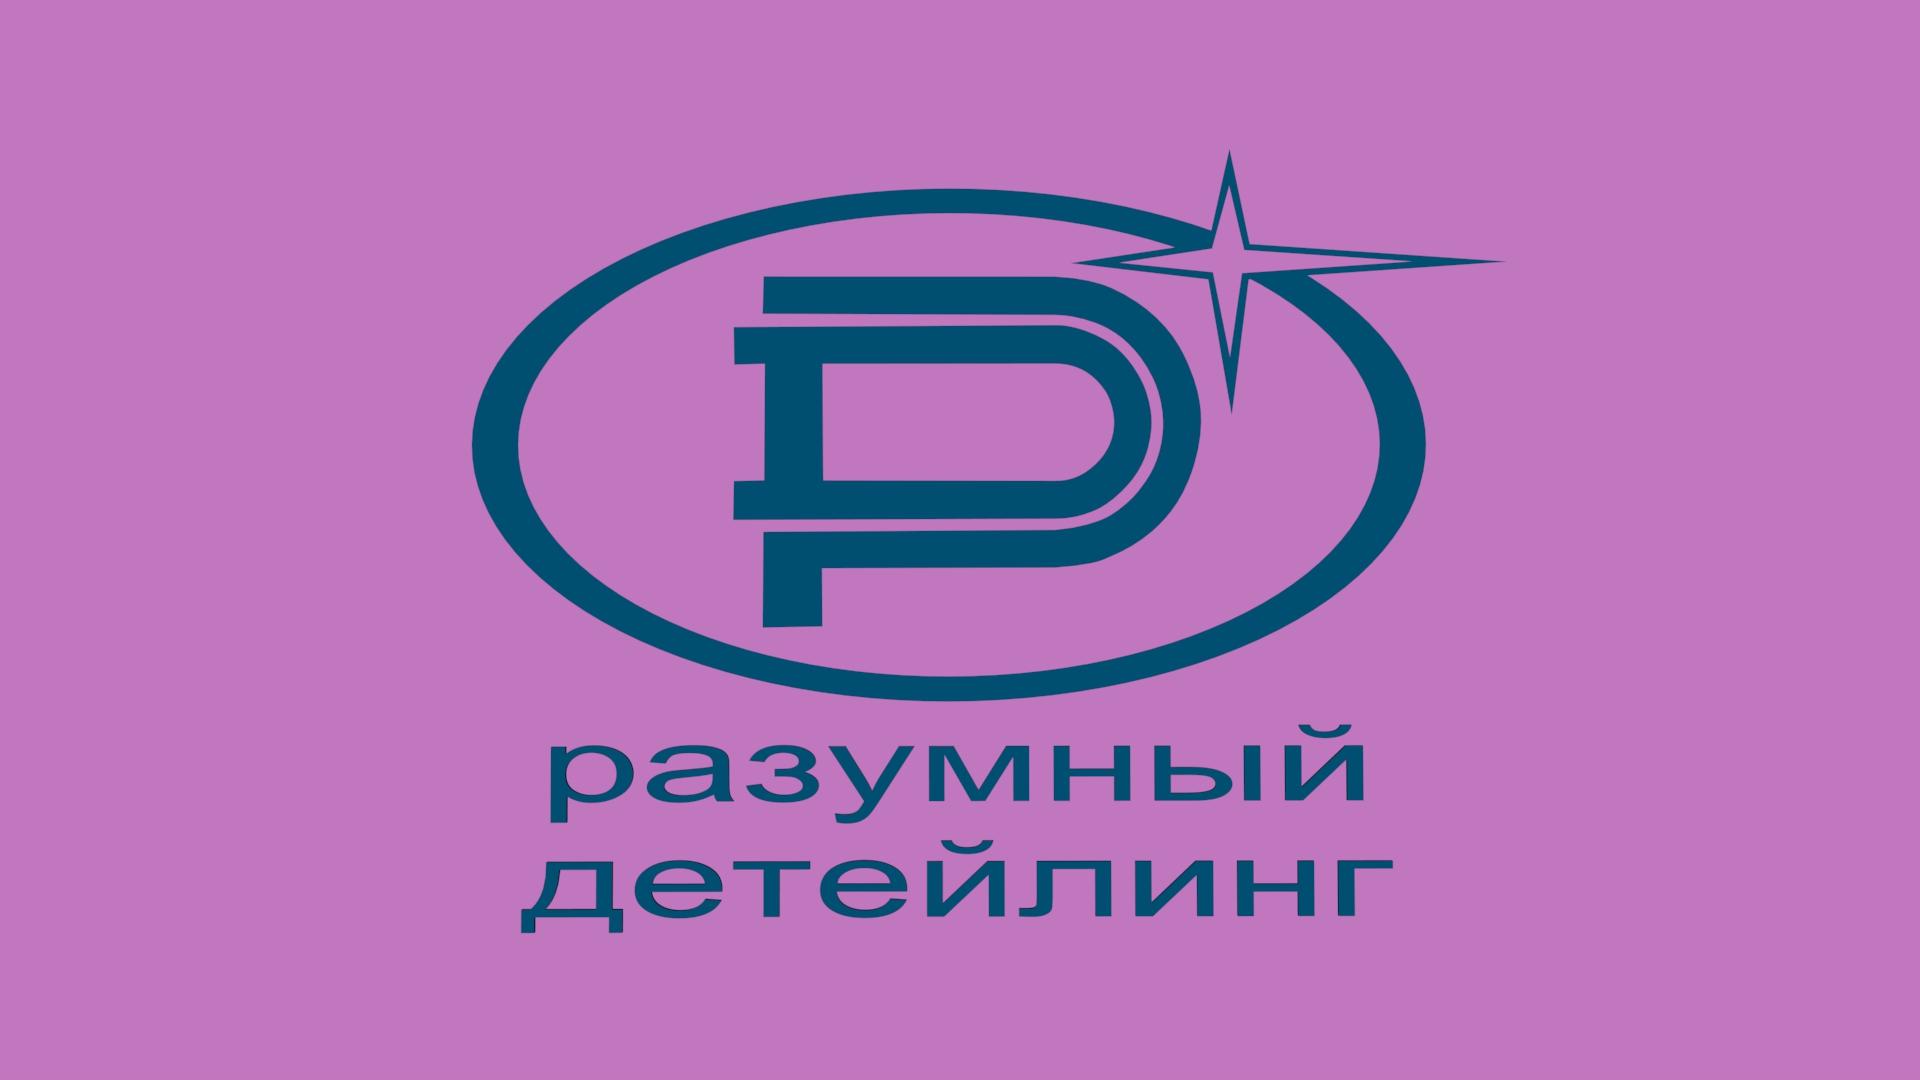 Ребрендинг логотипа  фото f_4195ae22304870b7.jpg